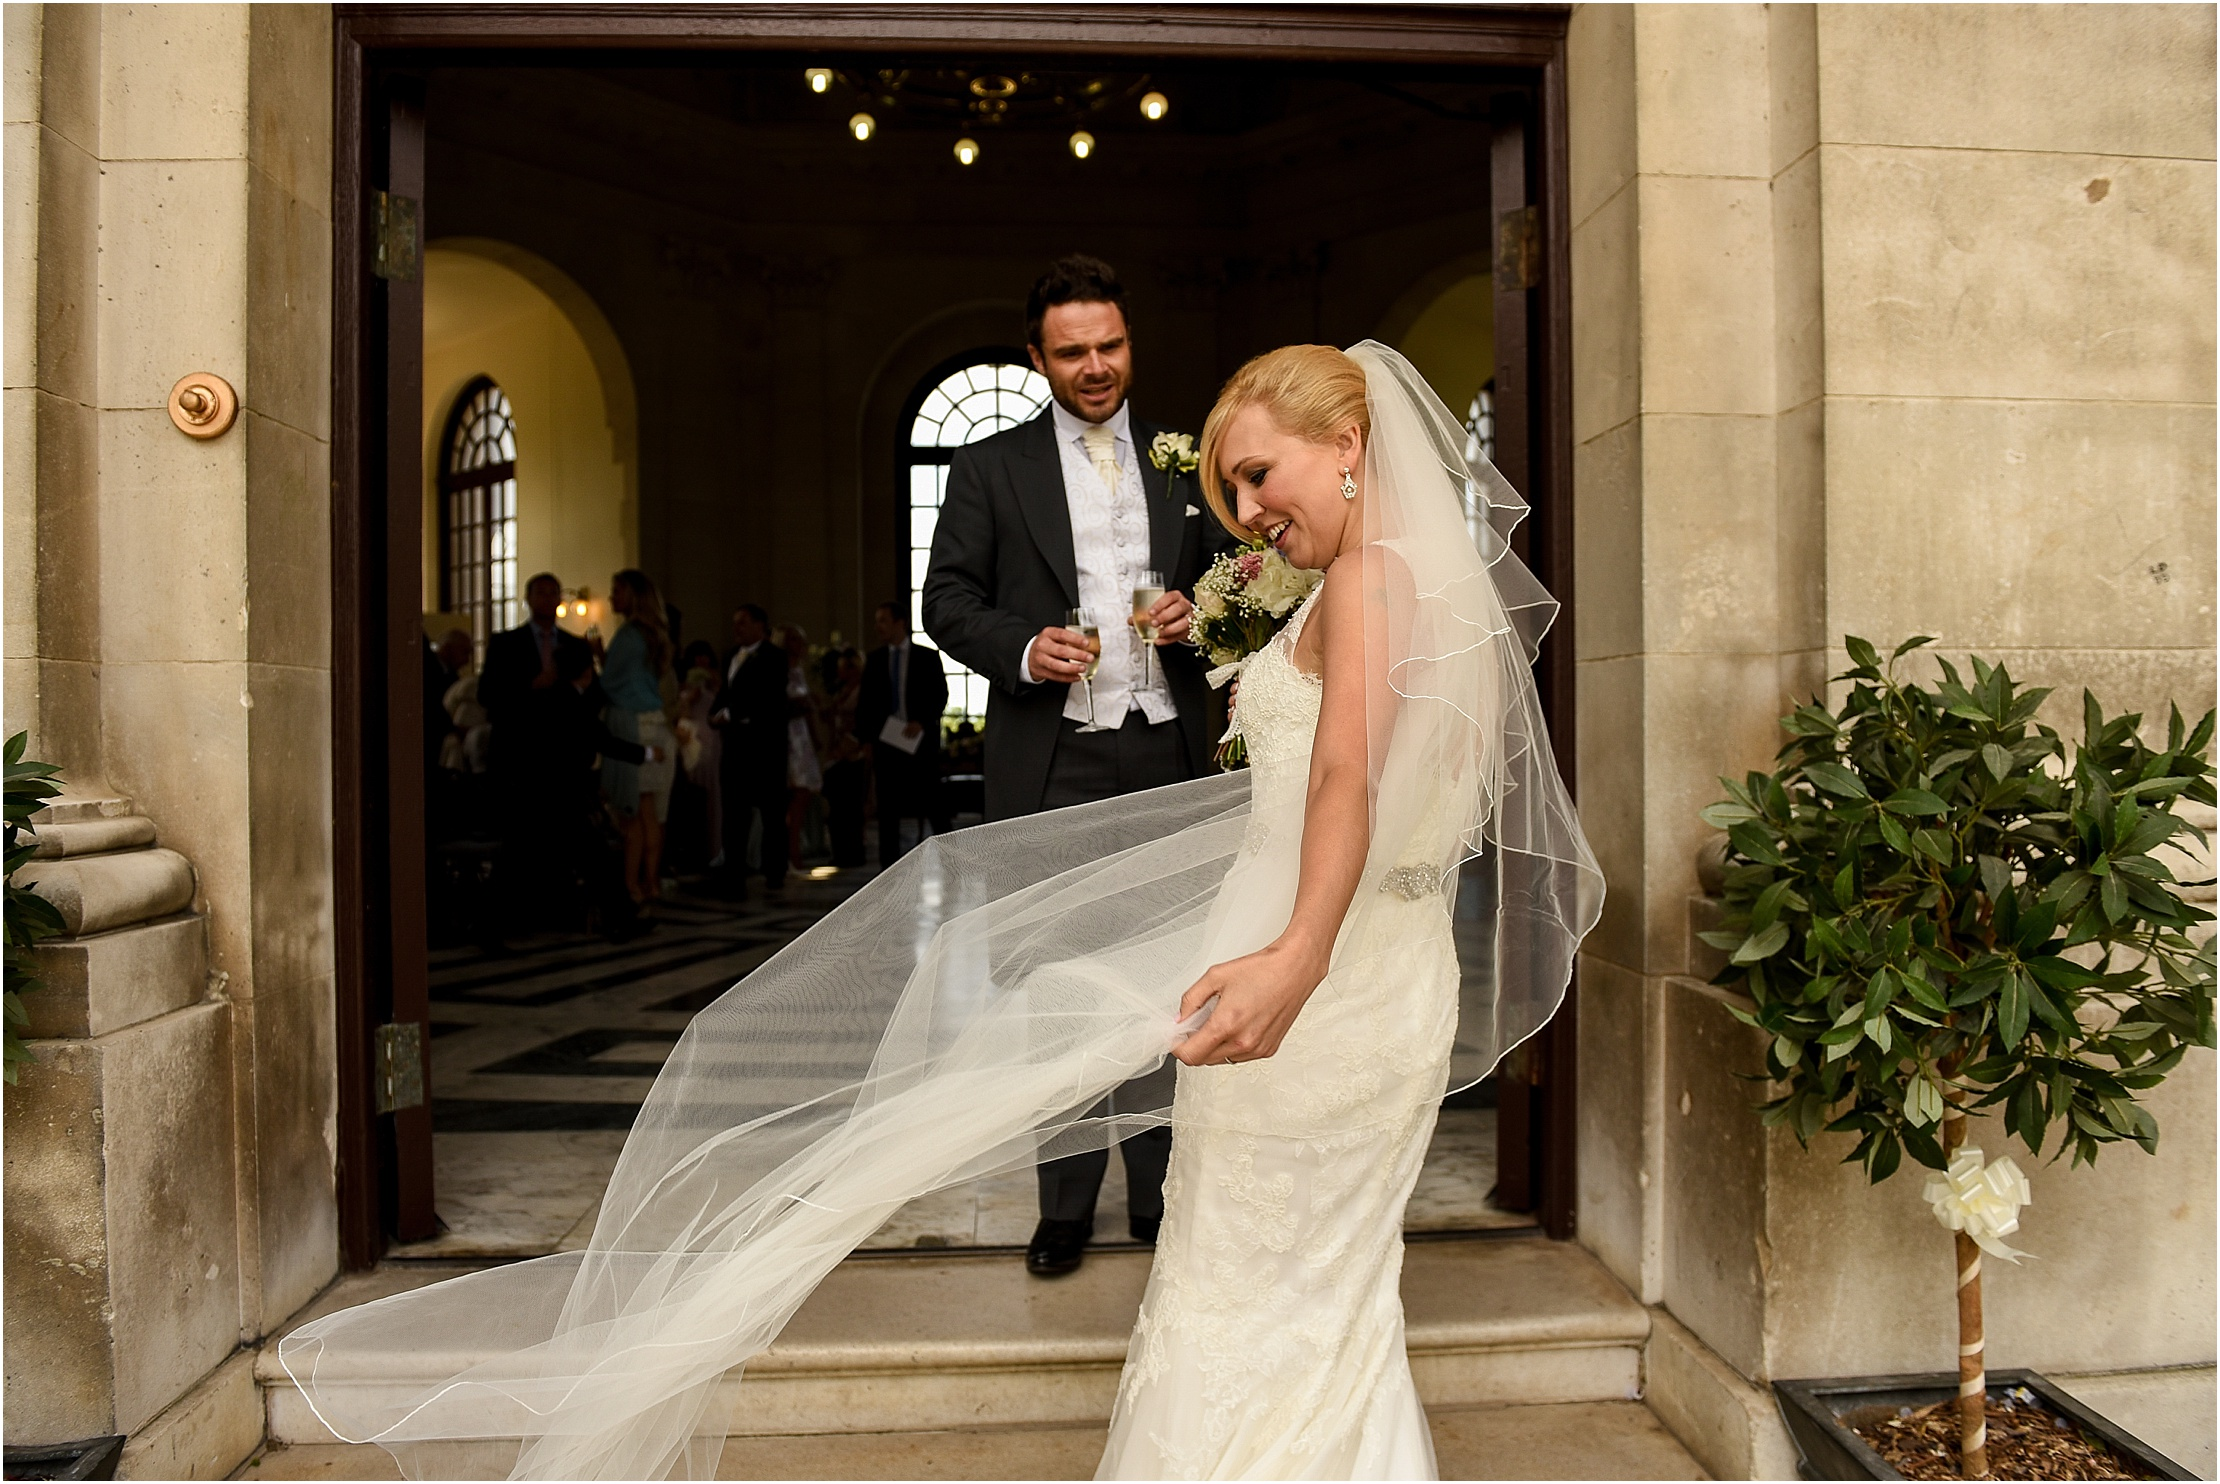 staining-lodge-wedding-074.jpg